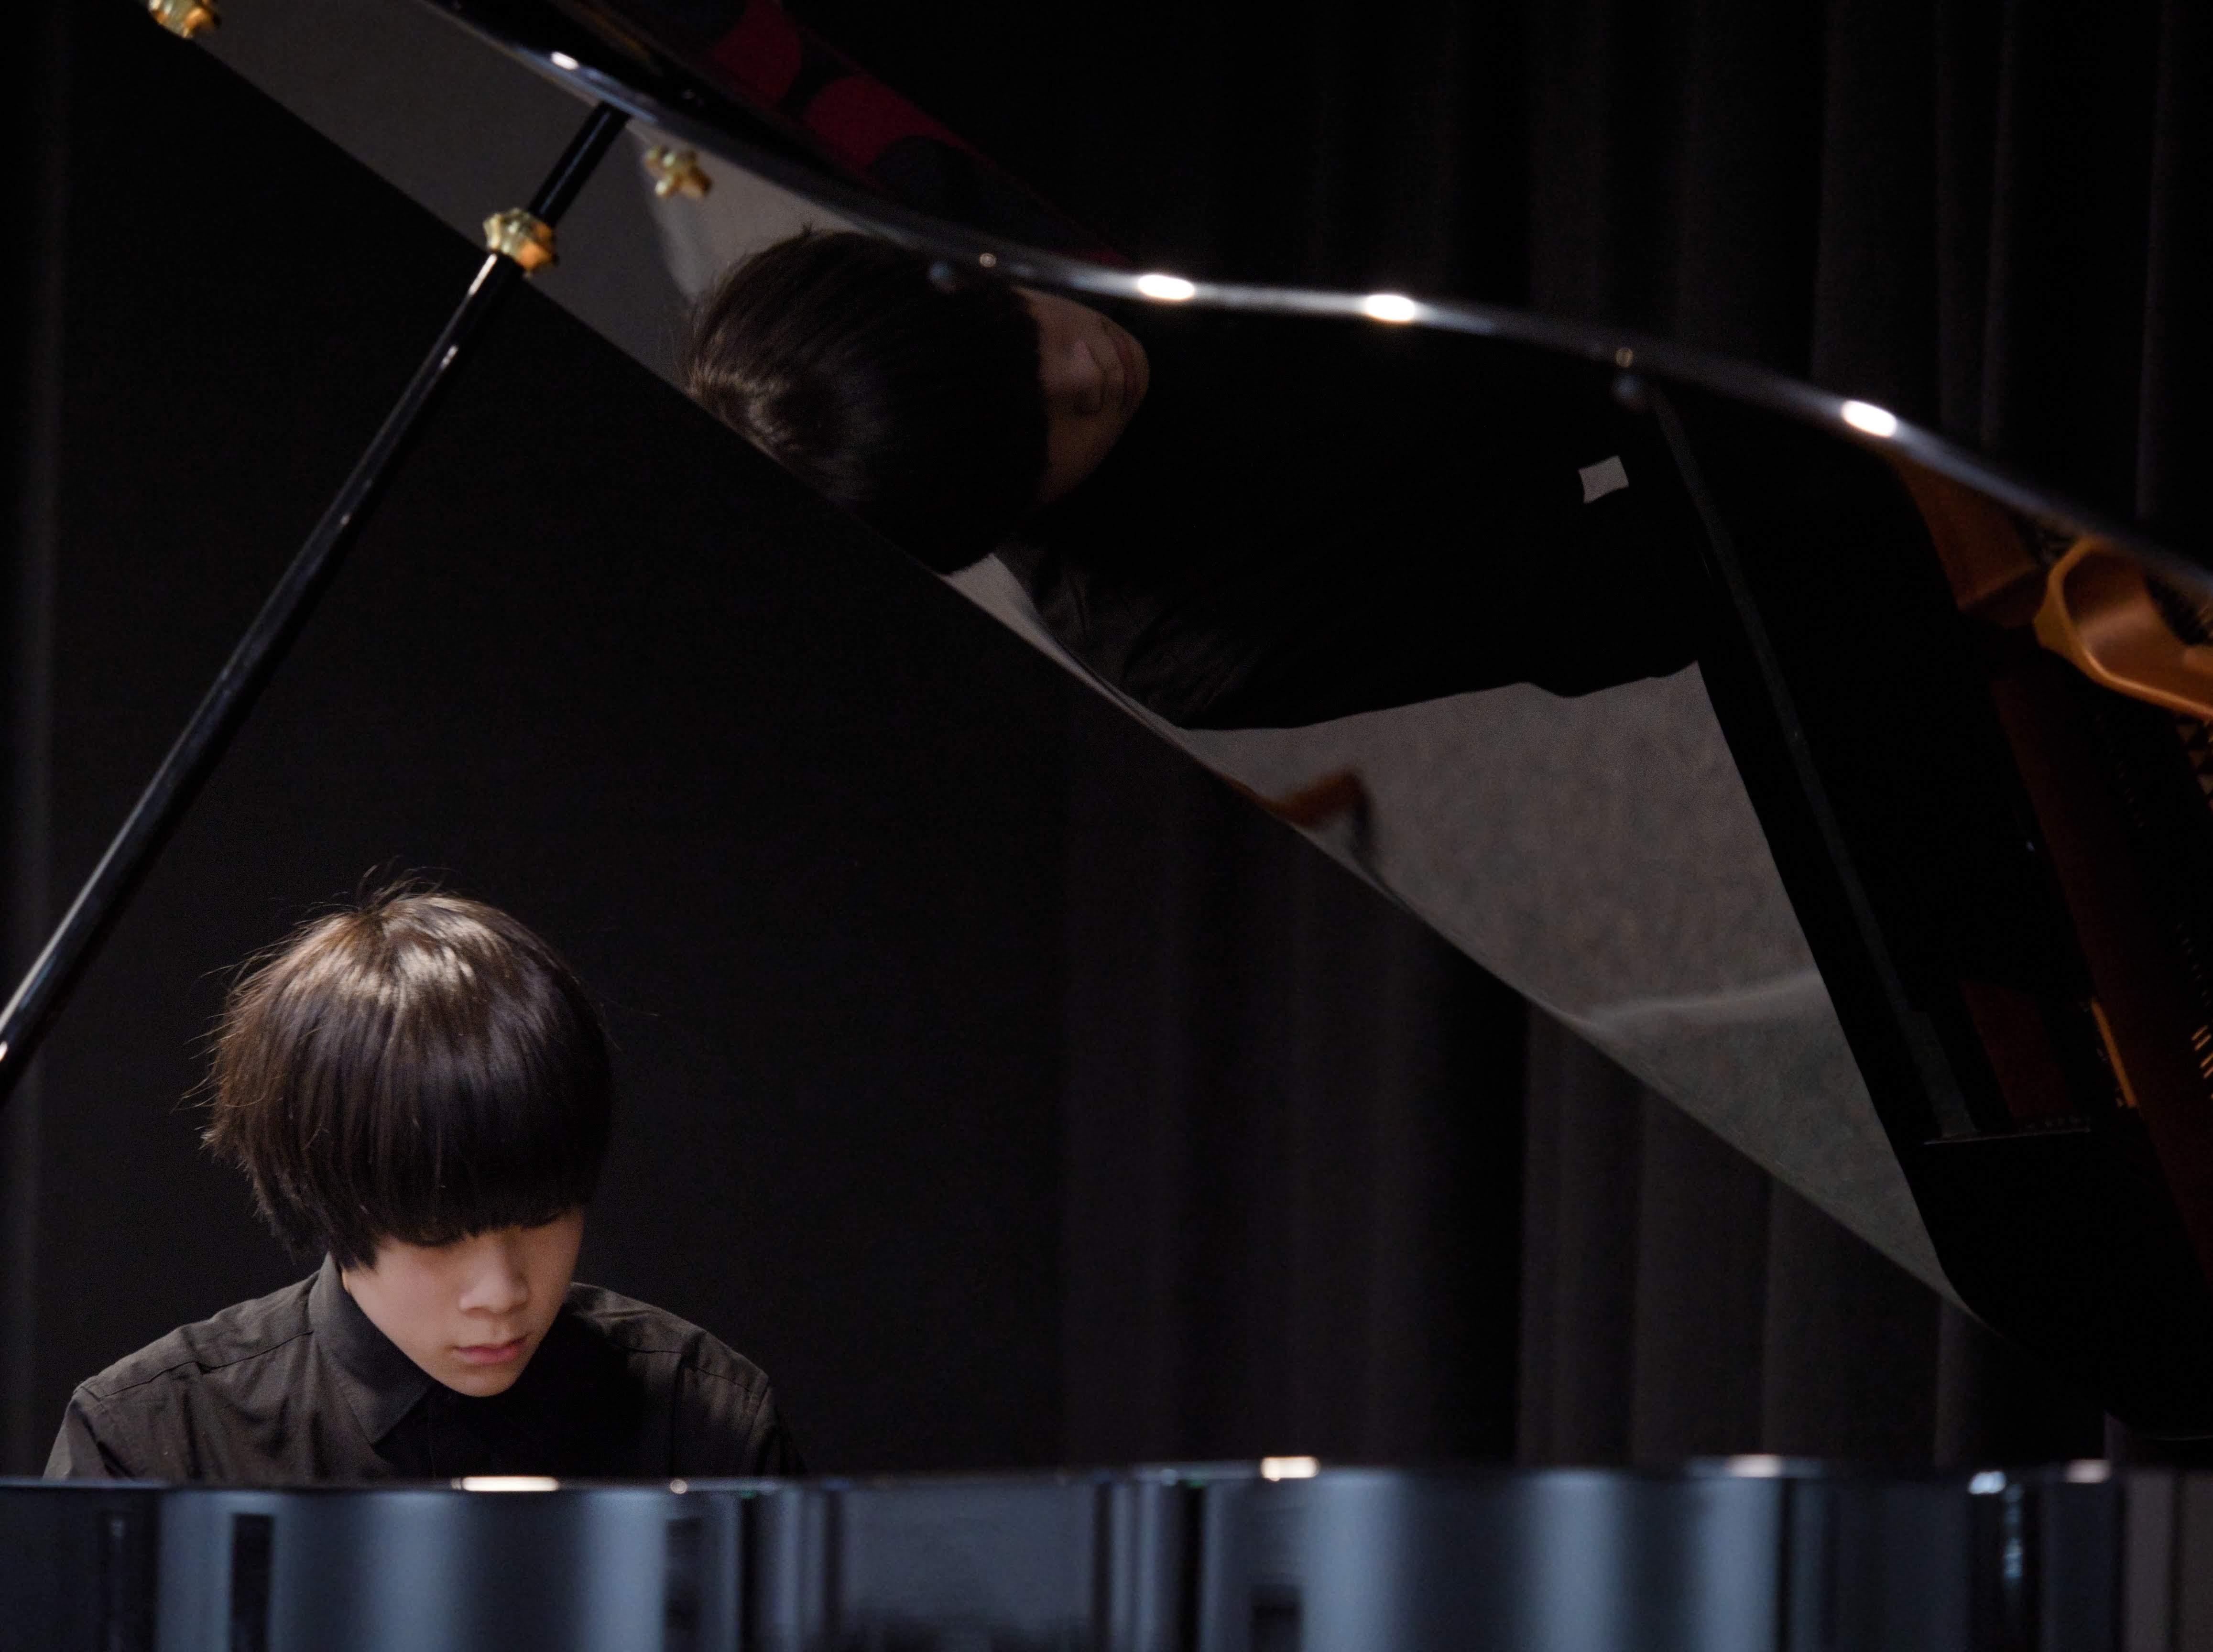 WGE Pianoforte Day 4 Max Jiang Displays His Skills on the Piano